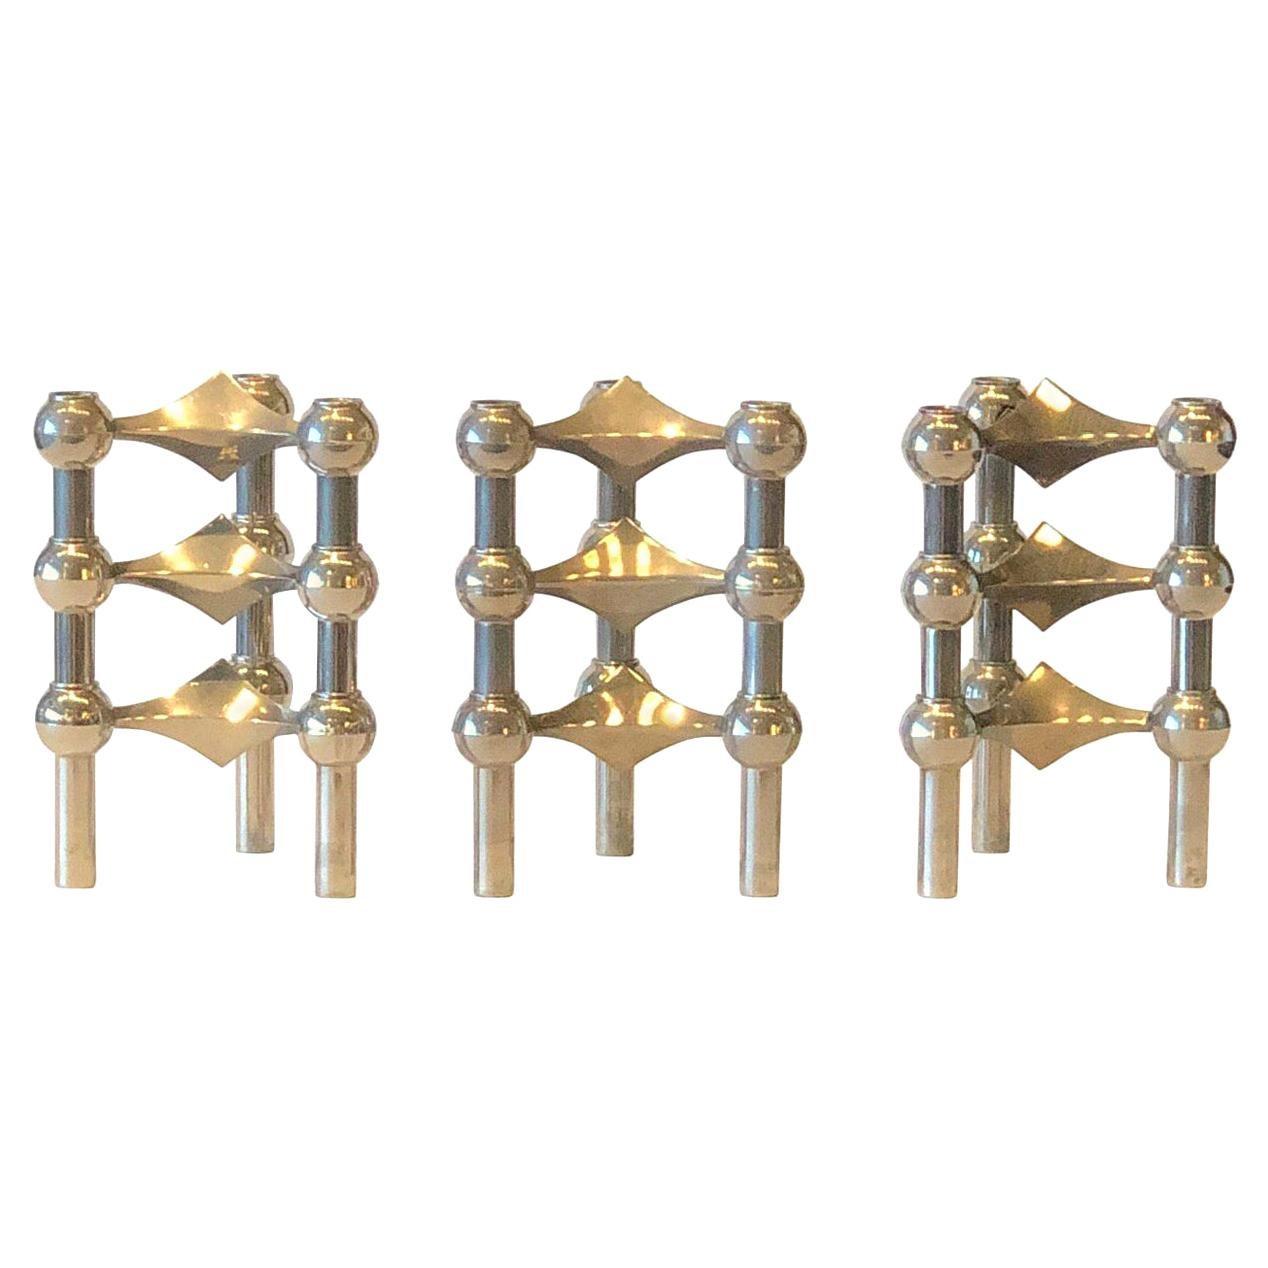 Set of 9 Fritz Nagel & Caesar Stoffi Stacking Stainless Steel Candleholders